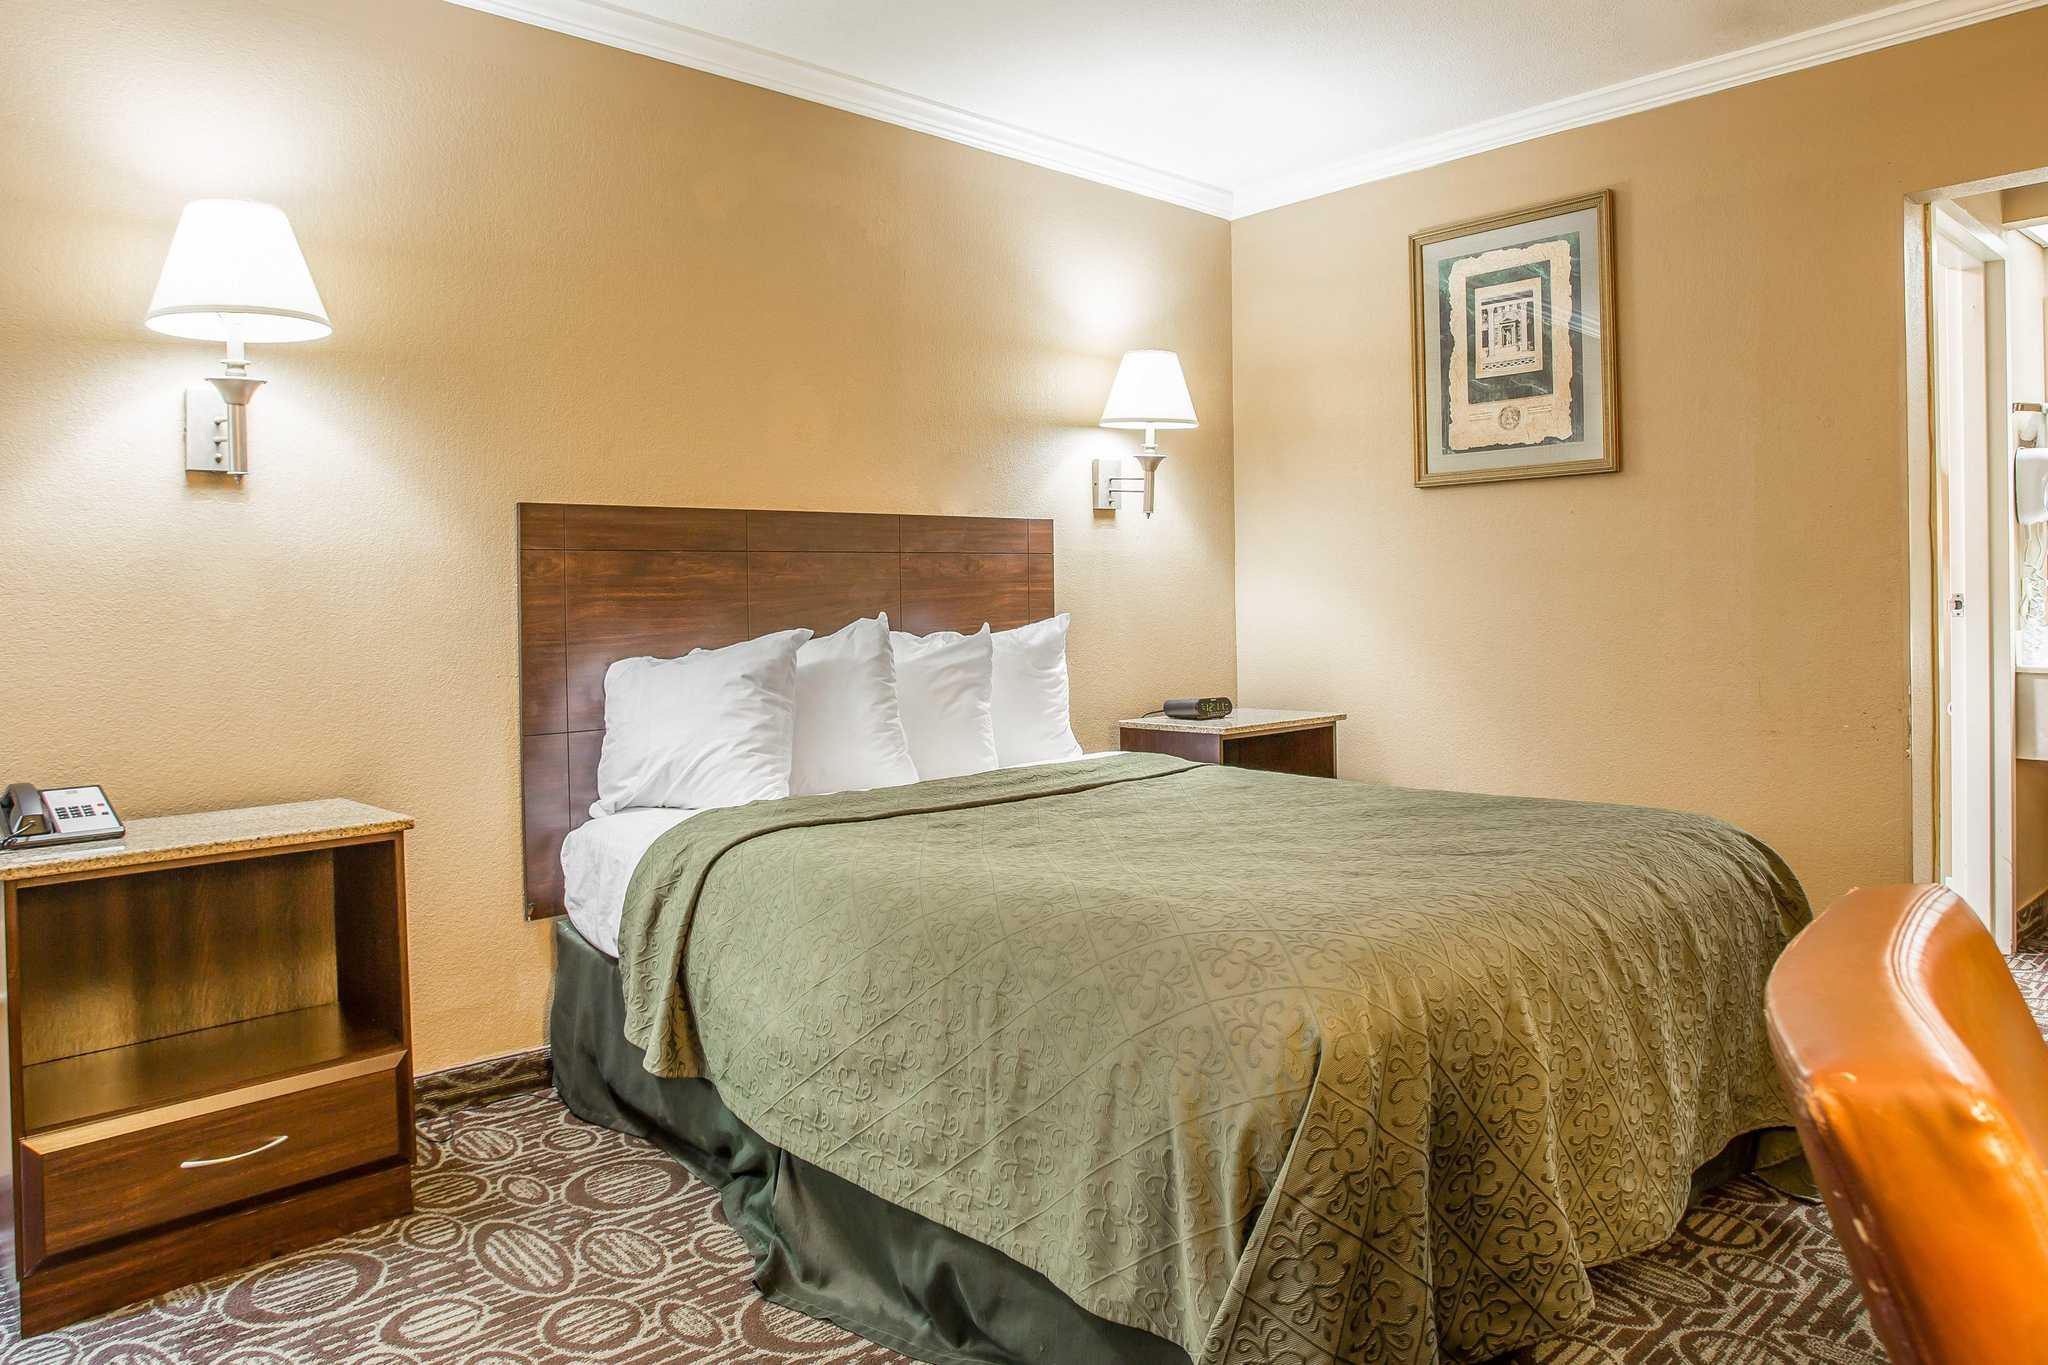 Quality Inn & Suites Ft. Jackson Maingate image 14